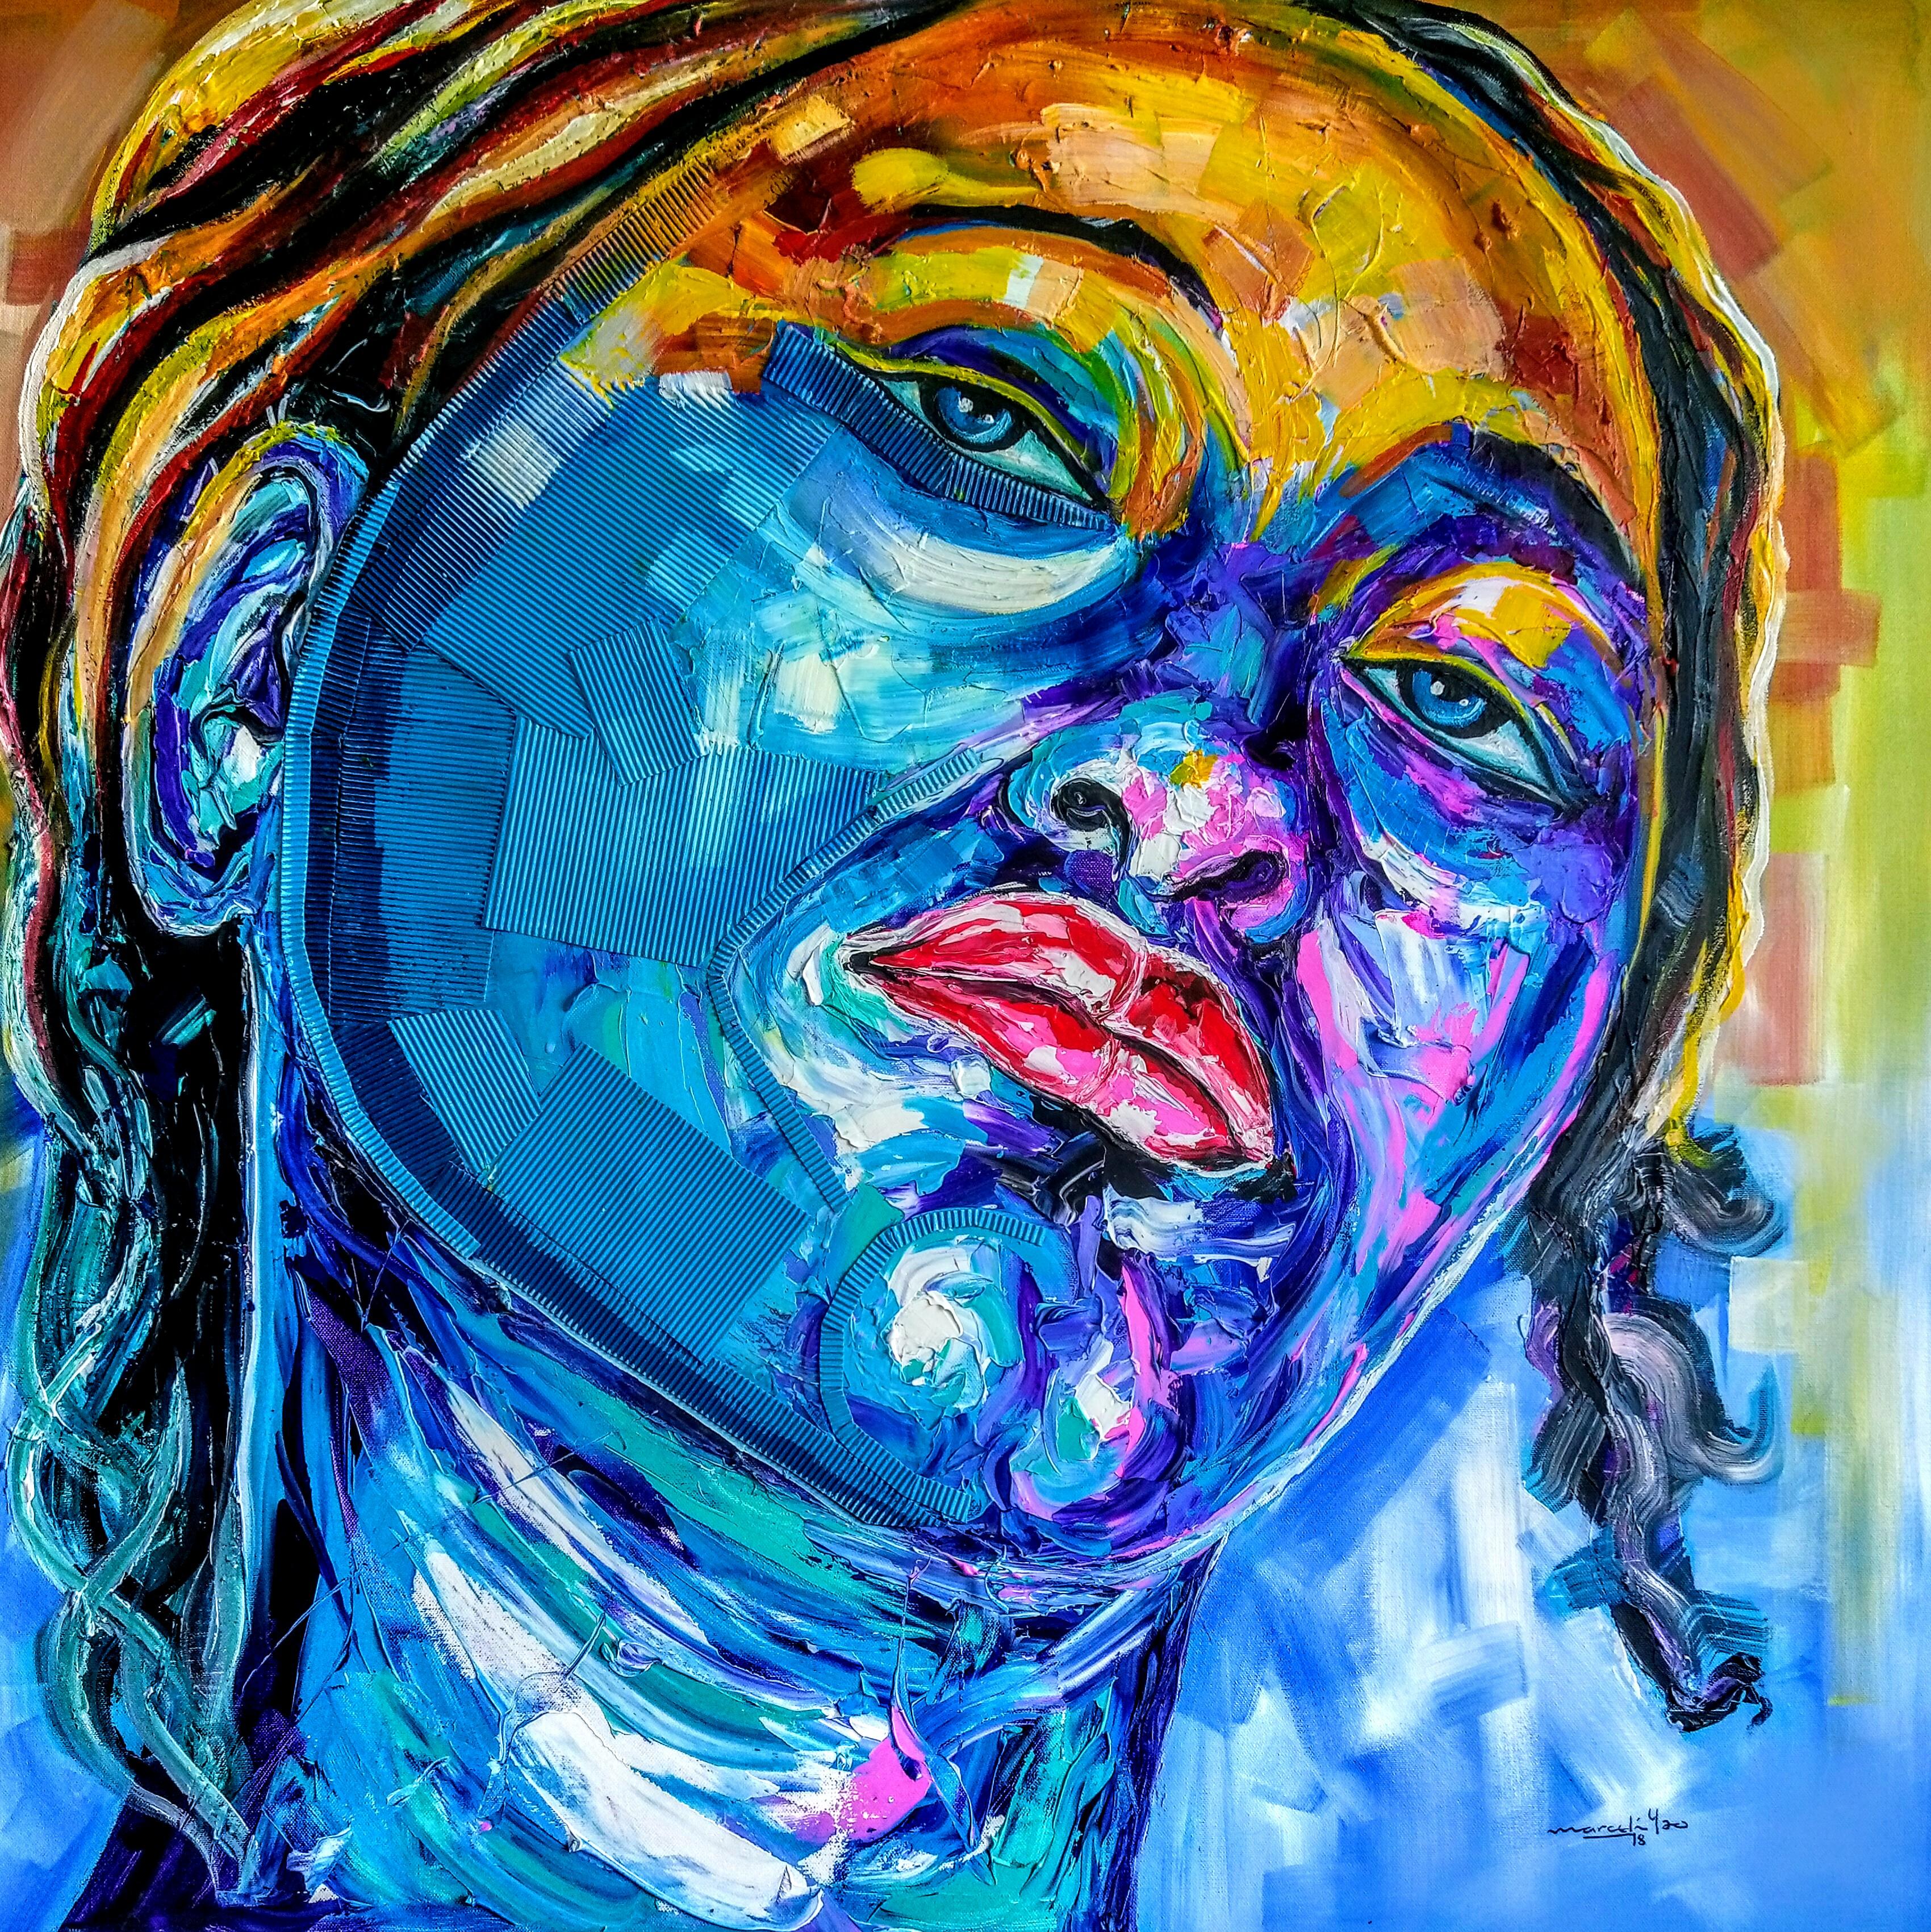 YAO-1 - FEMME ECLAIREE - 100 x 100